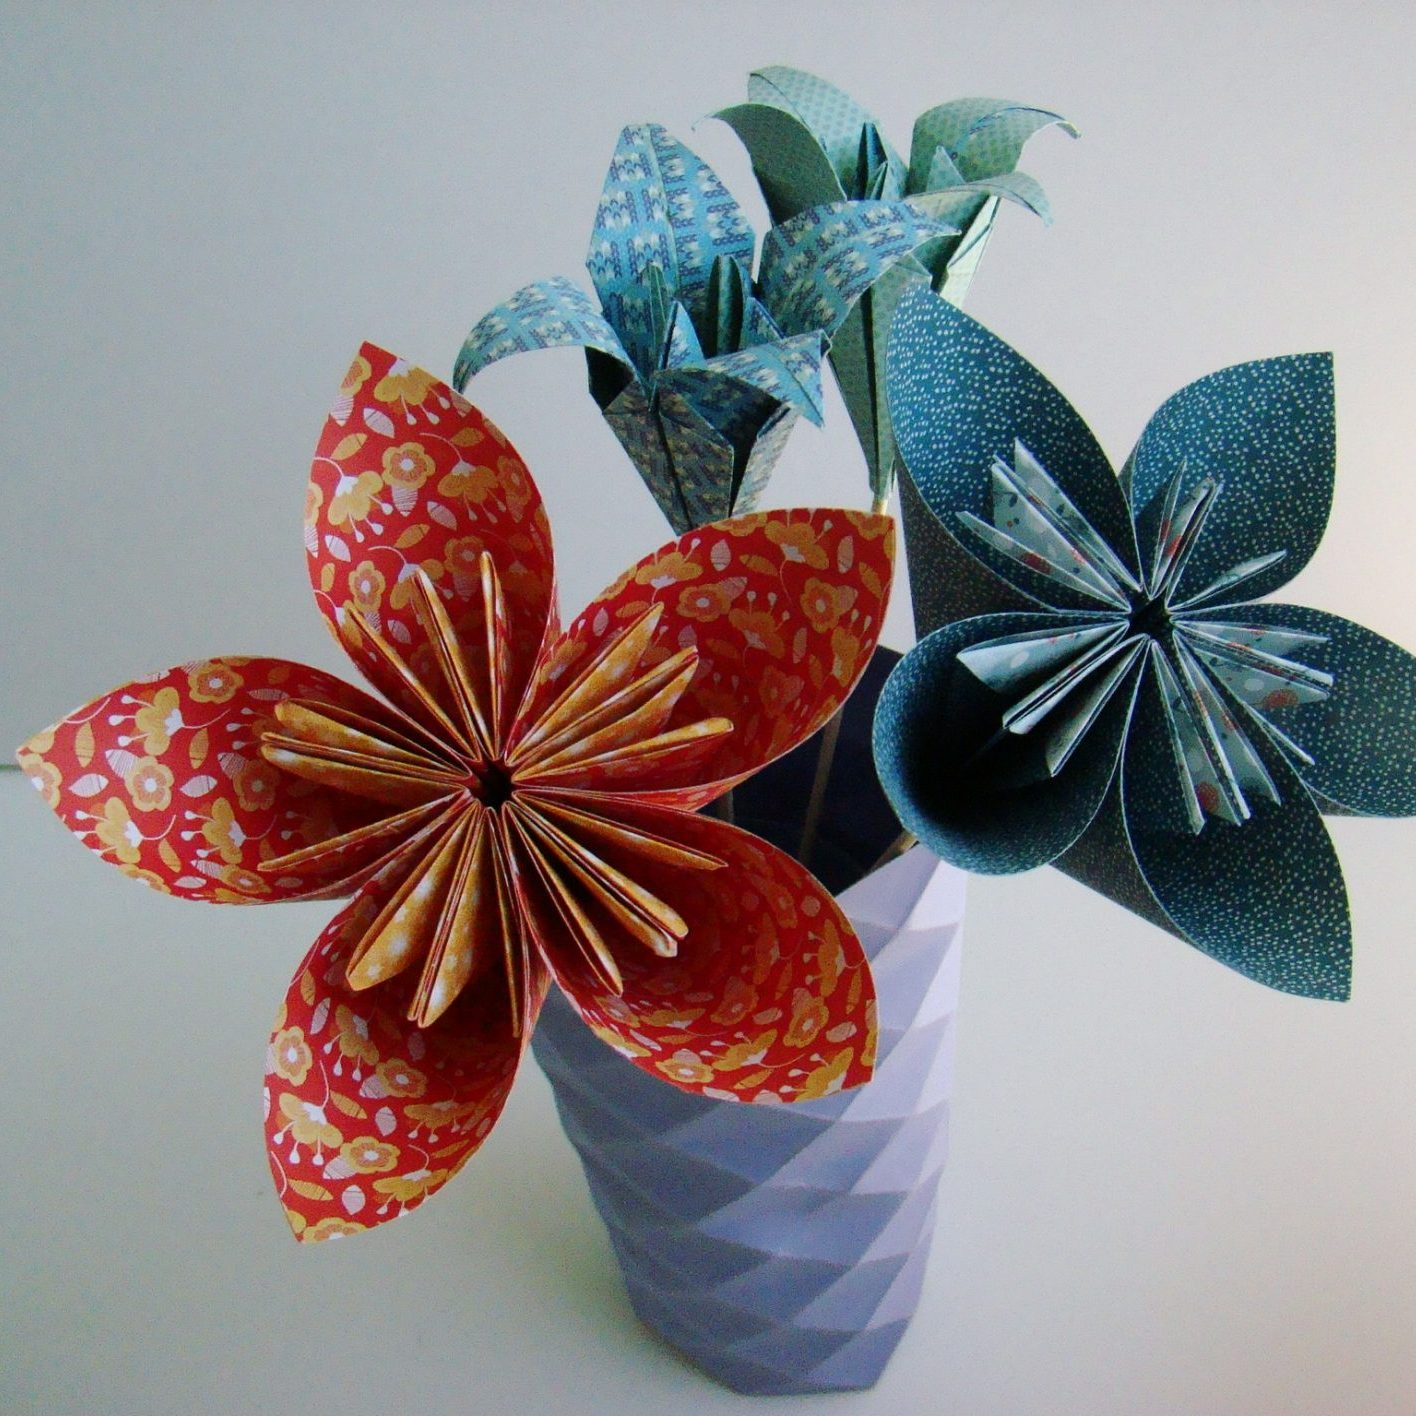 tuto fleur origami top tuto fleur origami with tuto fleur. Black Bedroom Furniture Sets. Home Design Ideas